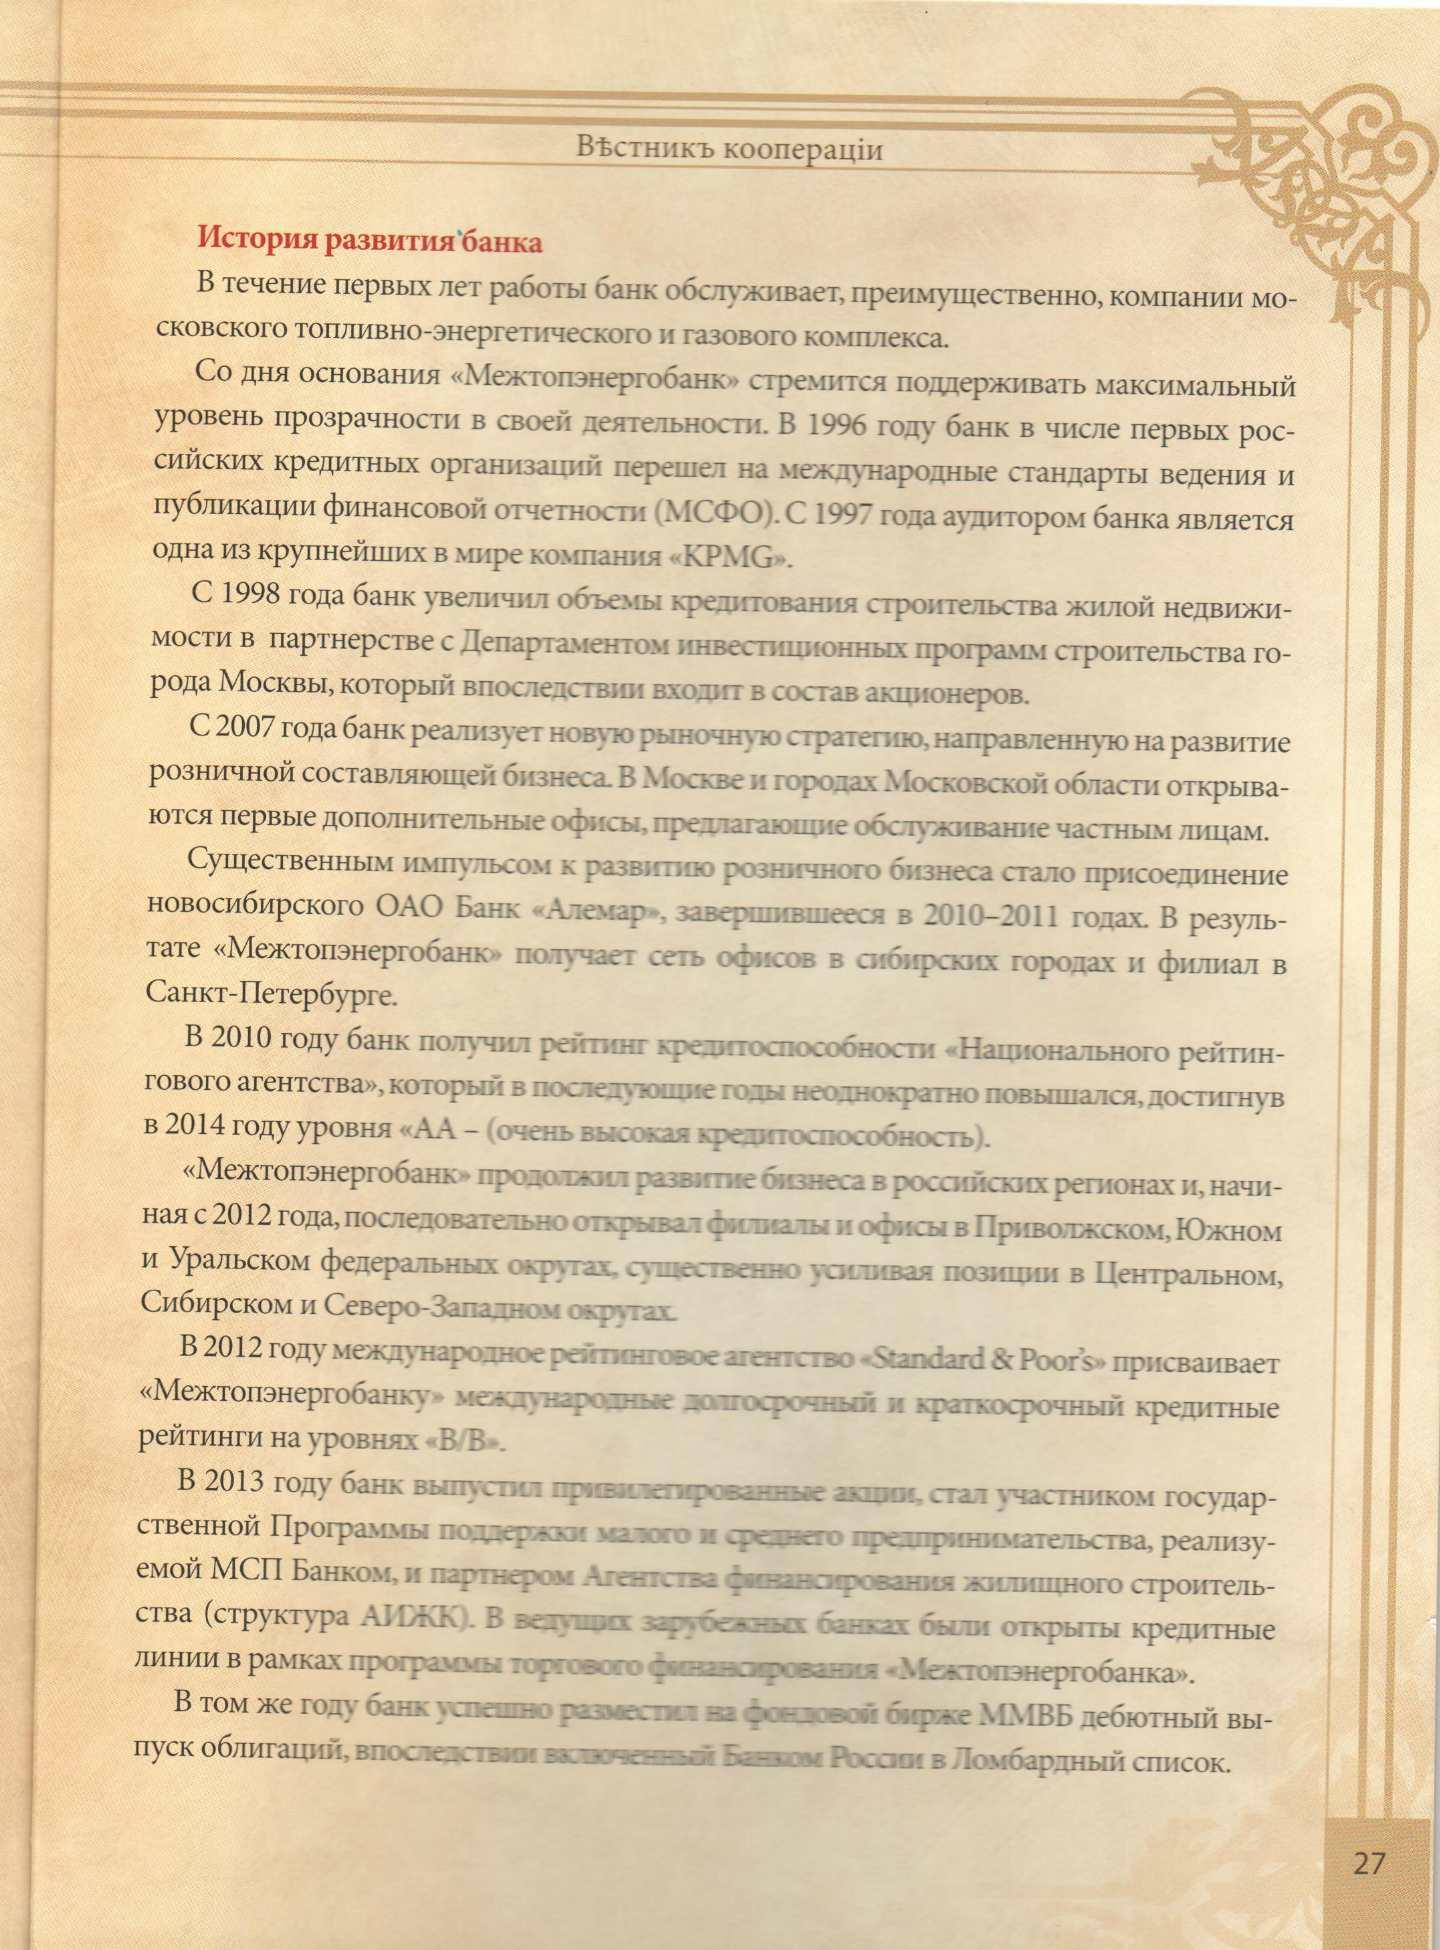 Вестник кооперации-27